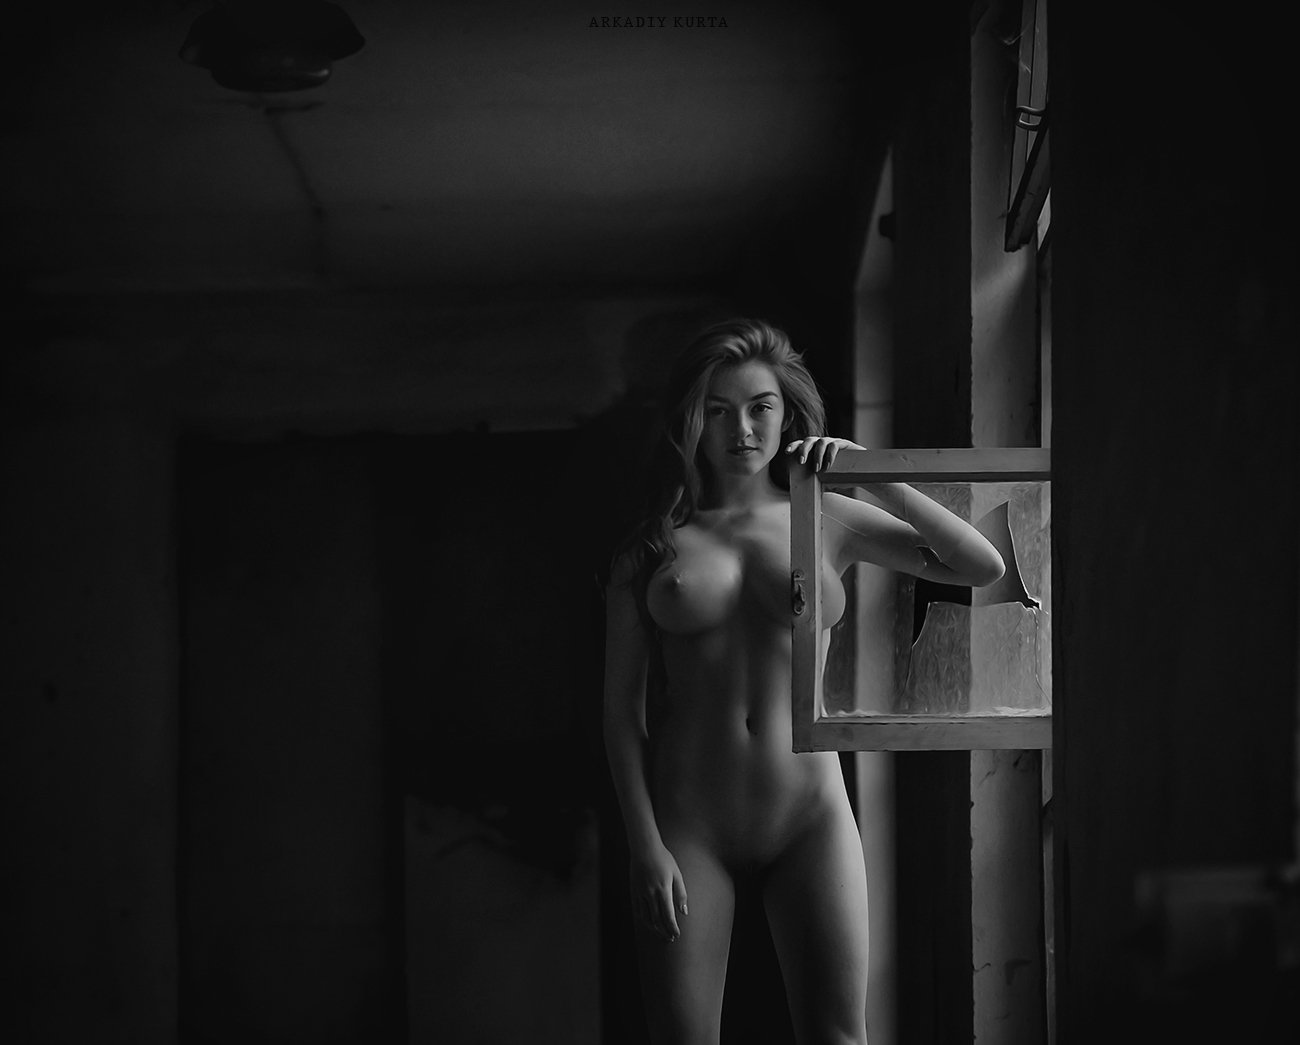 Nude, Nude art, Аркадий курта, Арт, Воркшоп, Монохром, Ню, Обнажённая натура, Фотопроект, Фототур, Эротика, Аркадий Курта